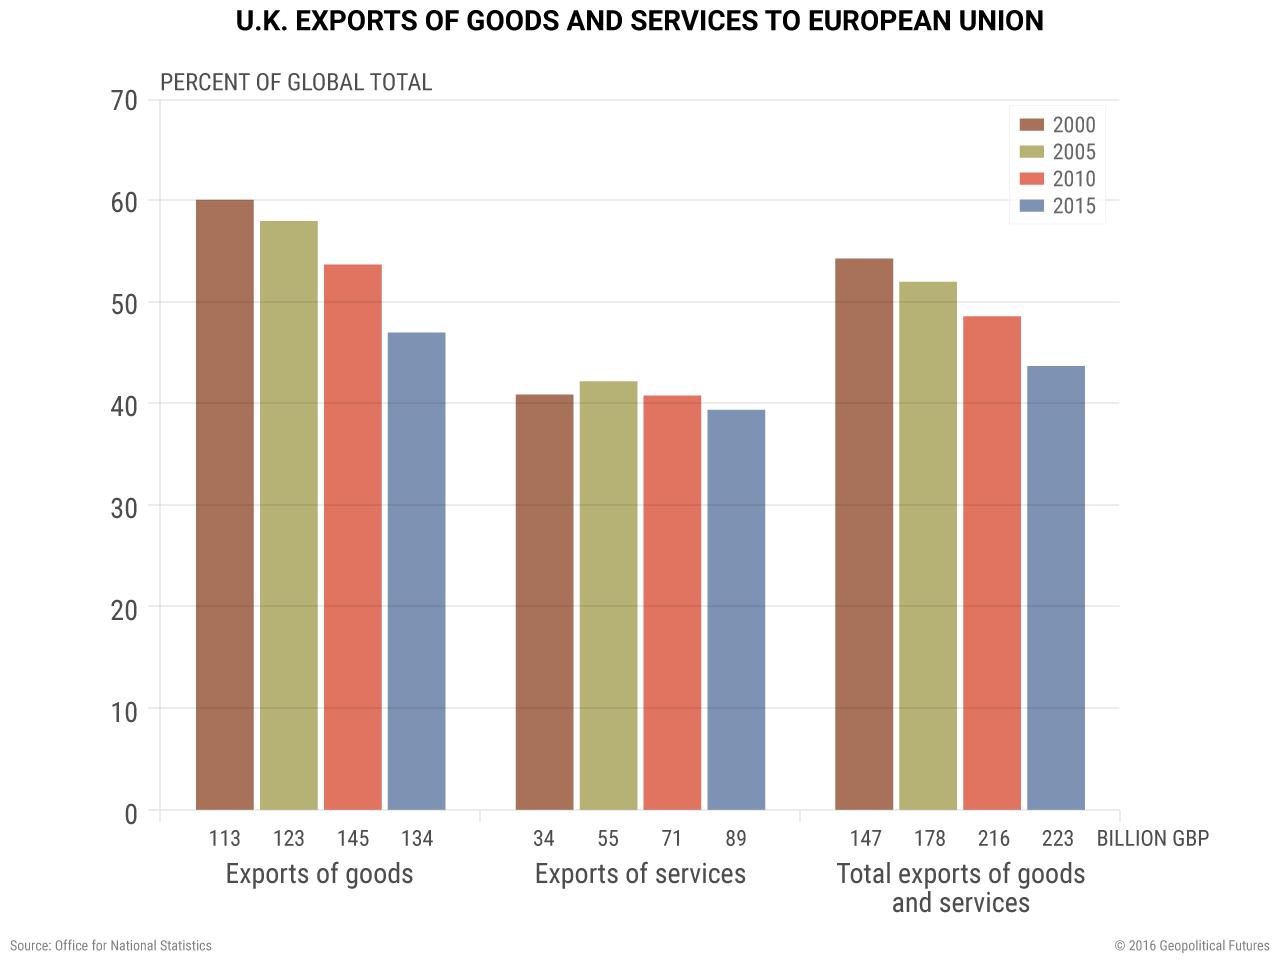 brexit-uk-exports-goods-services-european-union